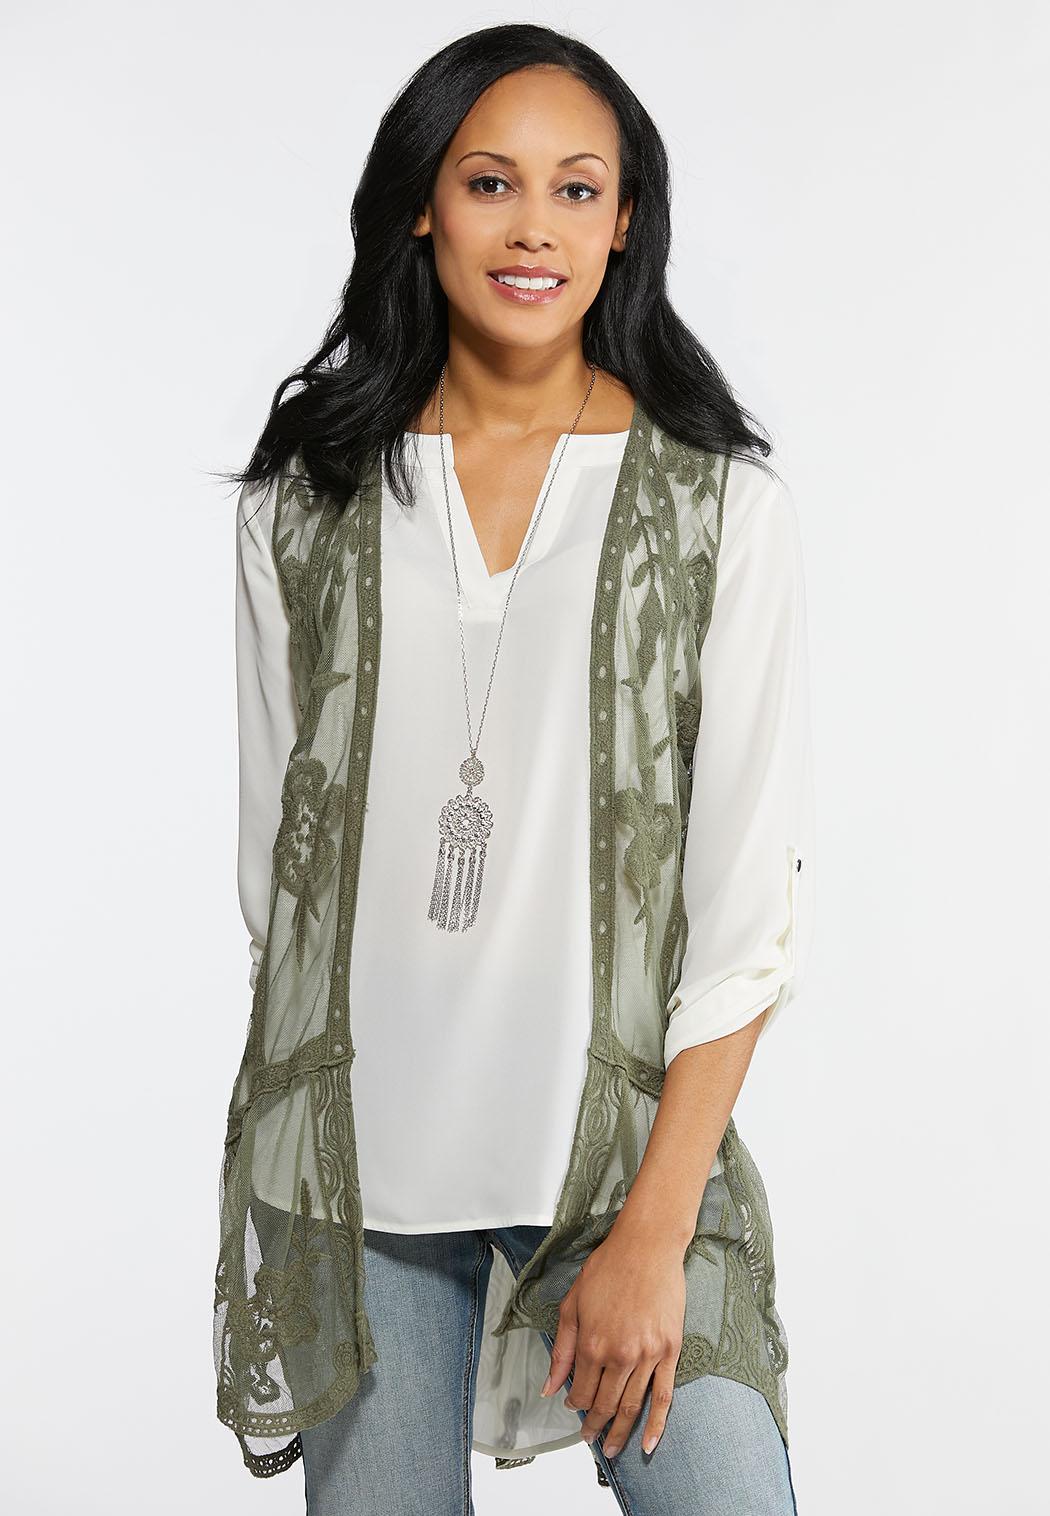 Plus Size Boho Lacy Vest Tops Cato Fashions